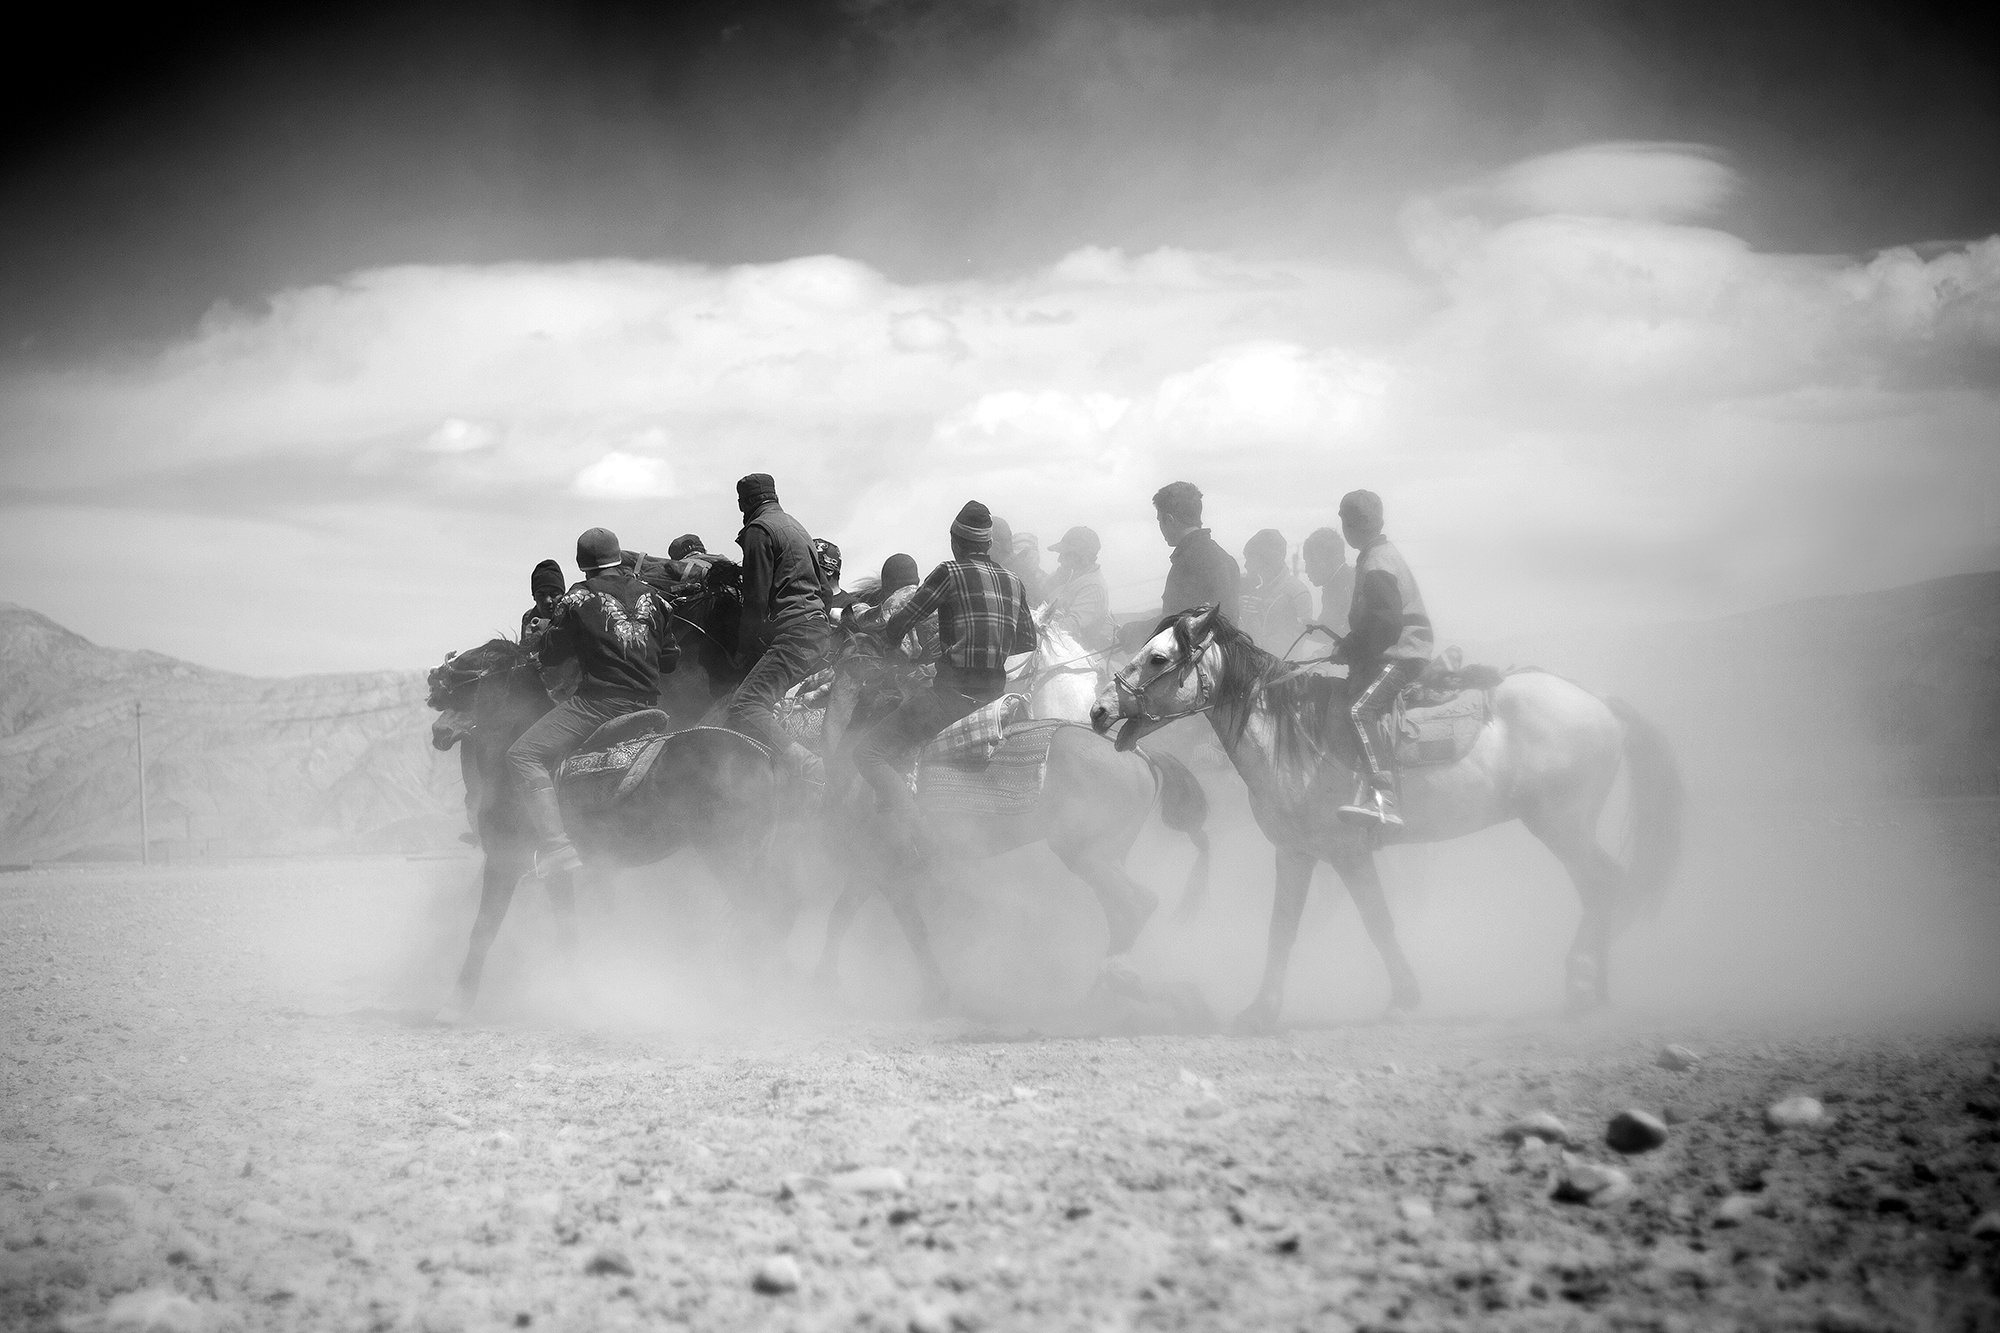 Xinjiang Région ouïghoure Maxime Crozet Identité Chine Bouzkachi